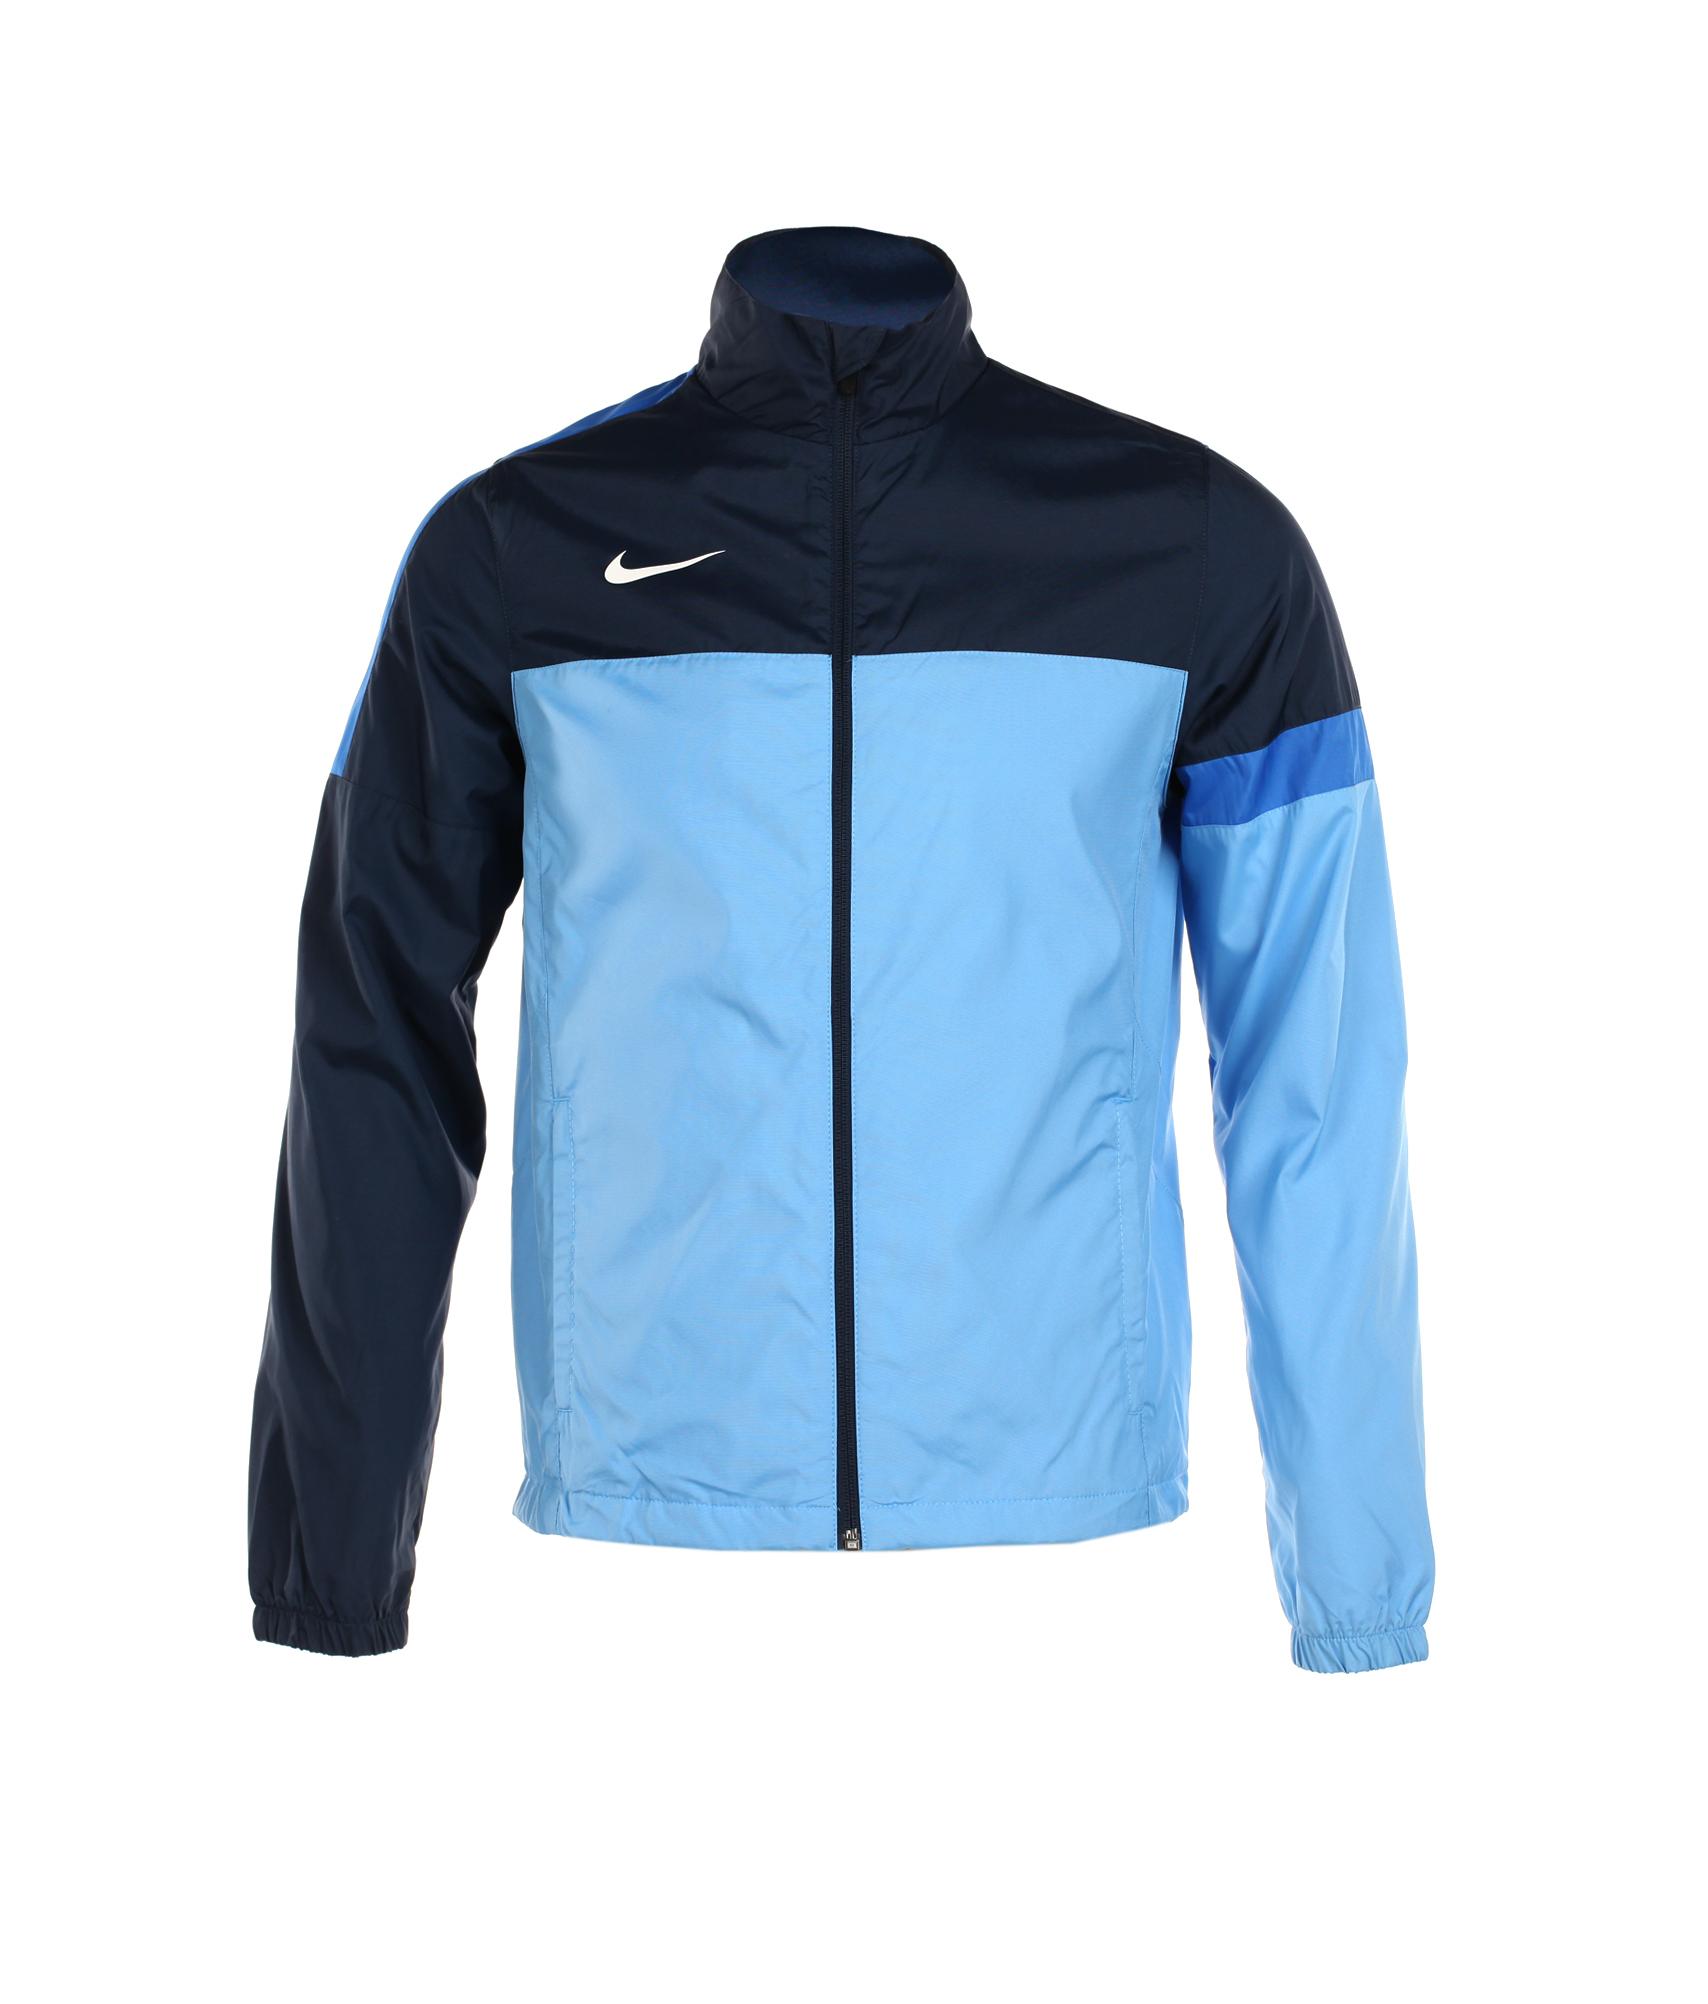 Куртка Nike Sideline WVN JKT WP WZ, Цвет-Синий, Размер-L